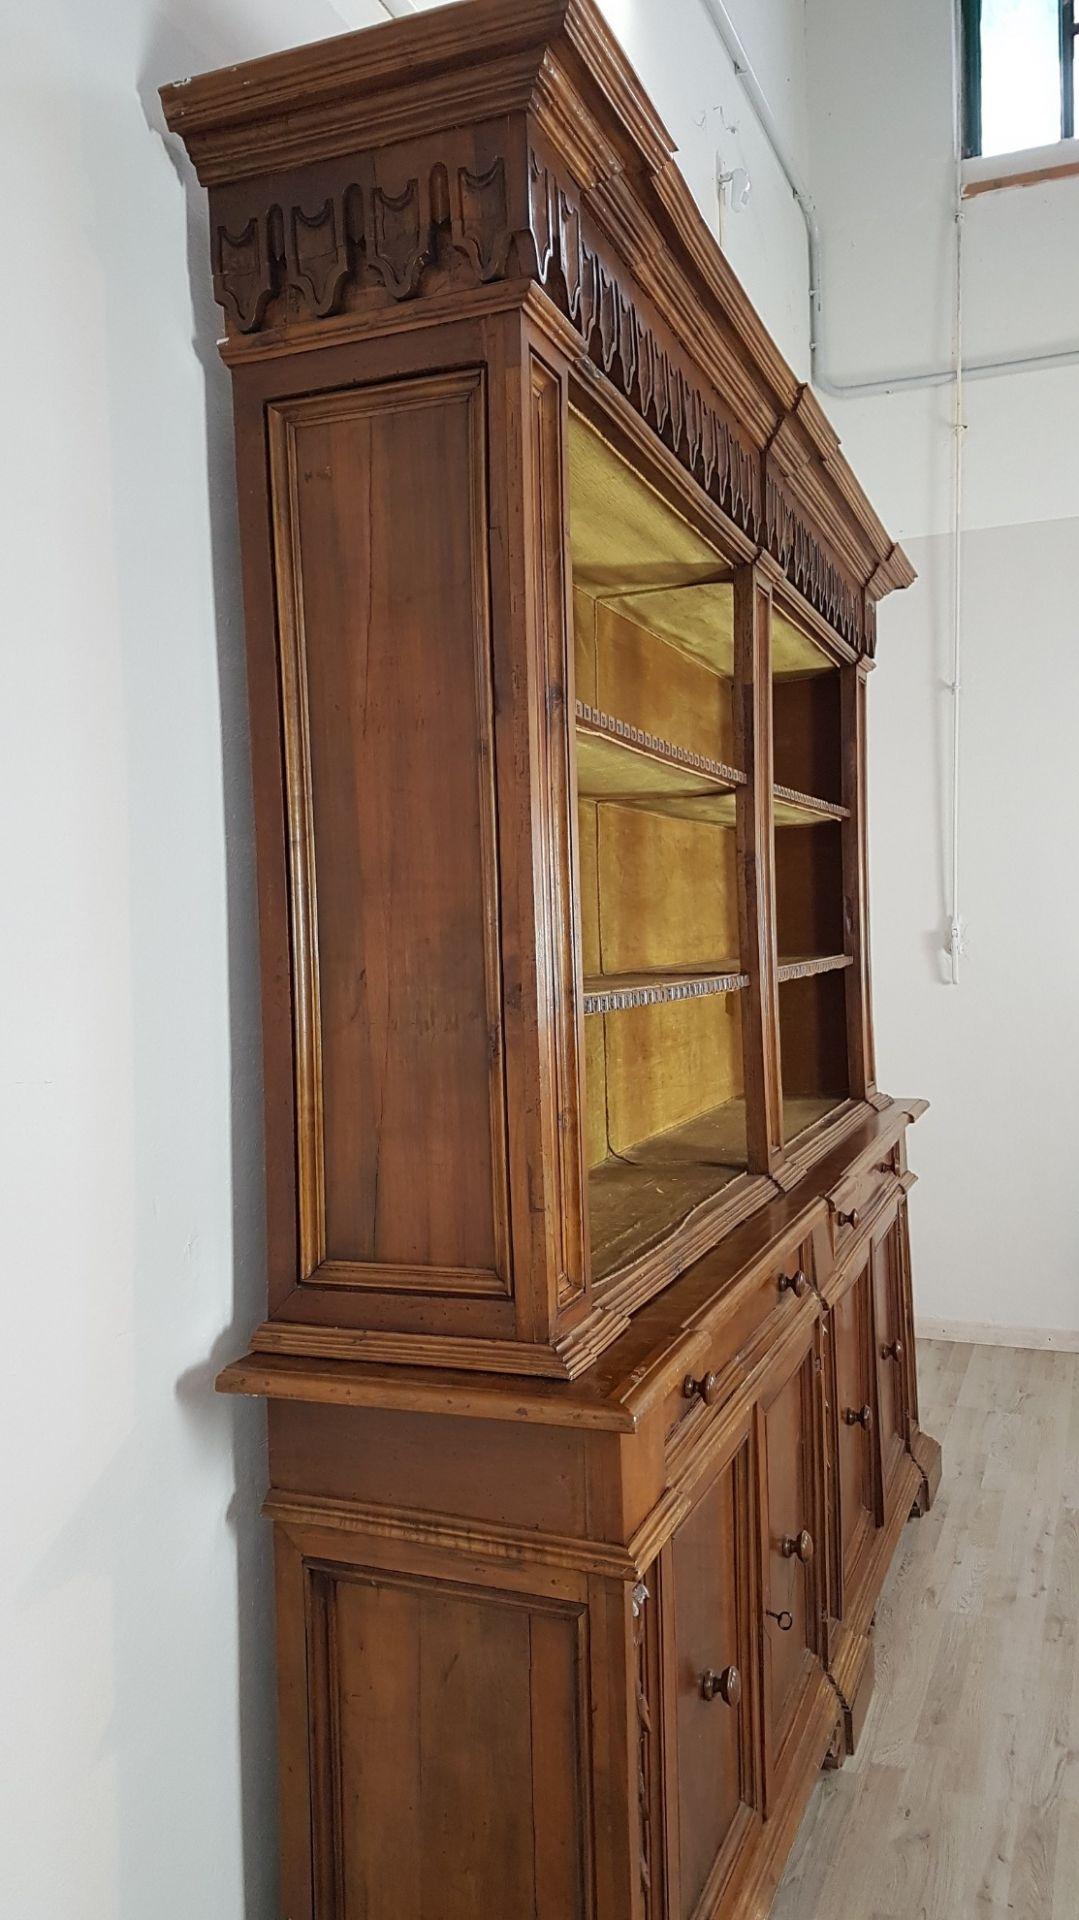 19th Century Antique Italian Walnut Wood Bookcase or Sideboard